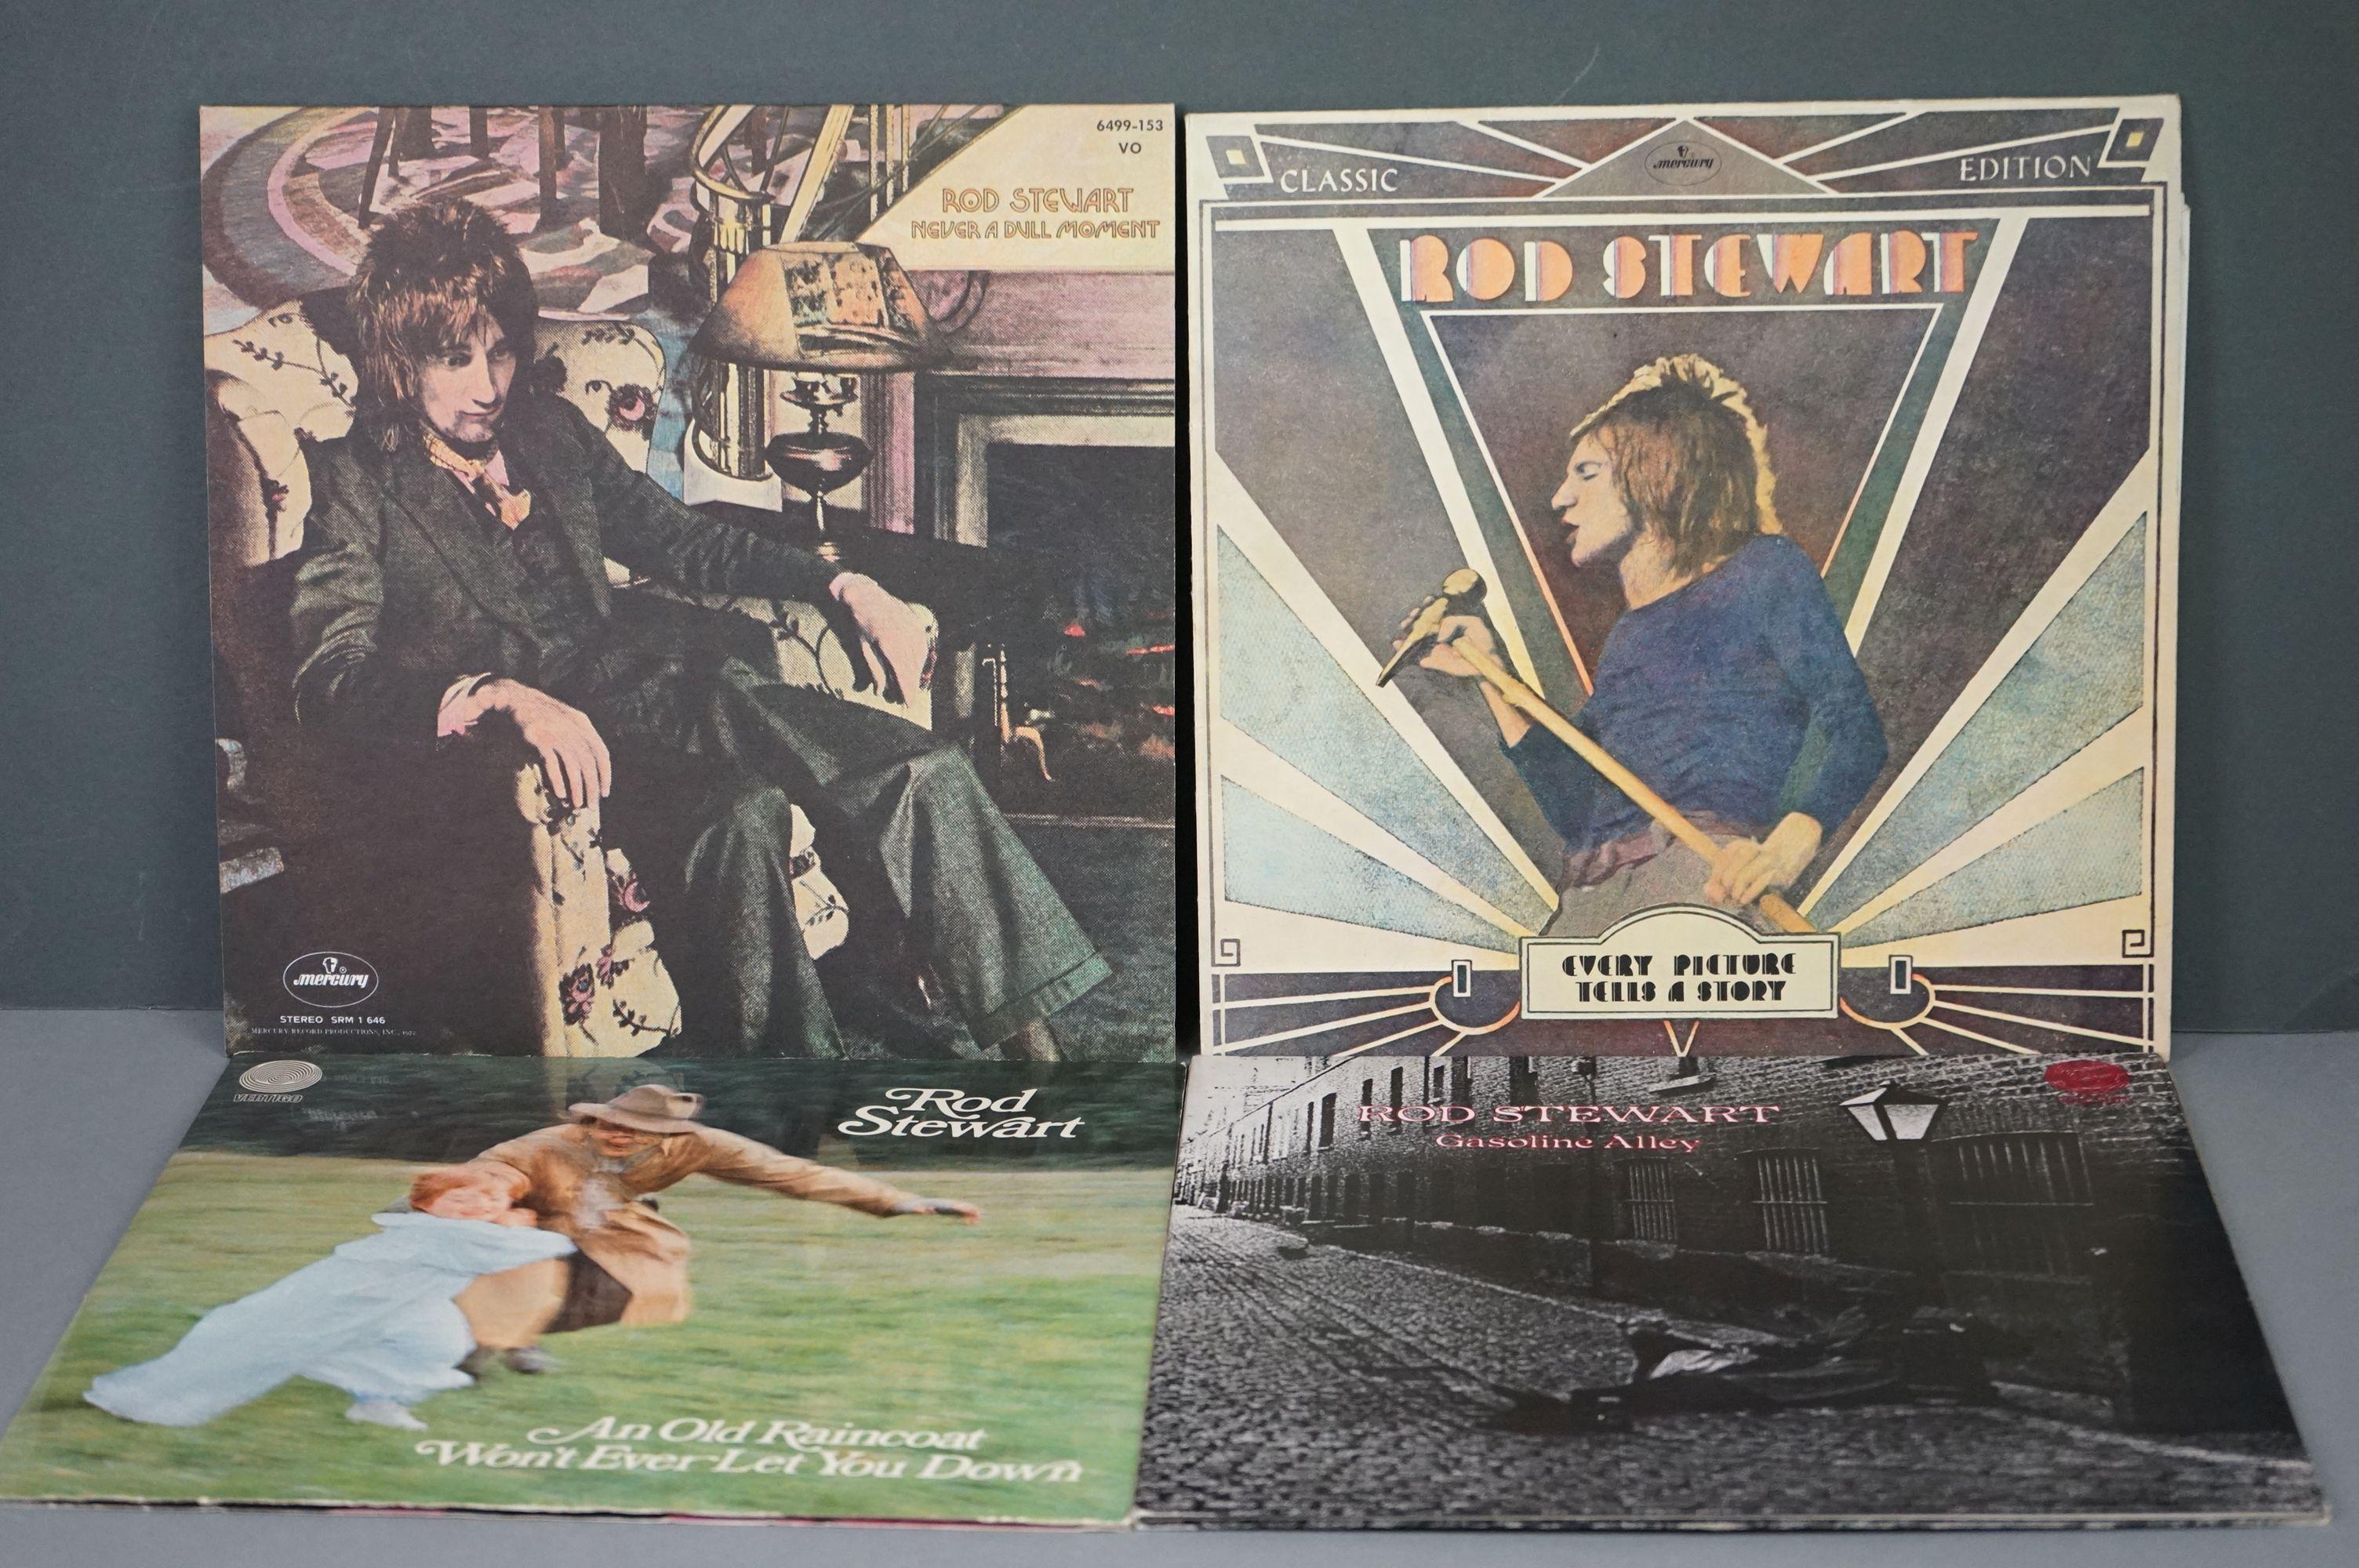 Vinyl - Rod Stewart 4 LP's to include An Old Raincoat Won't Ever Let You Down (Vertigo VO4) gatefold